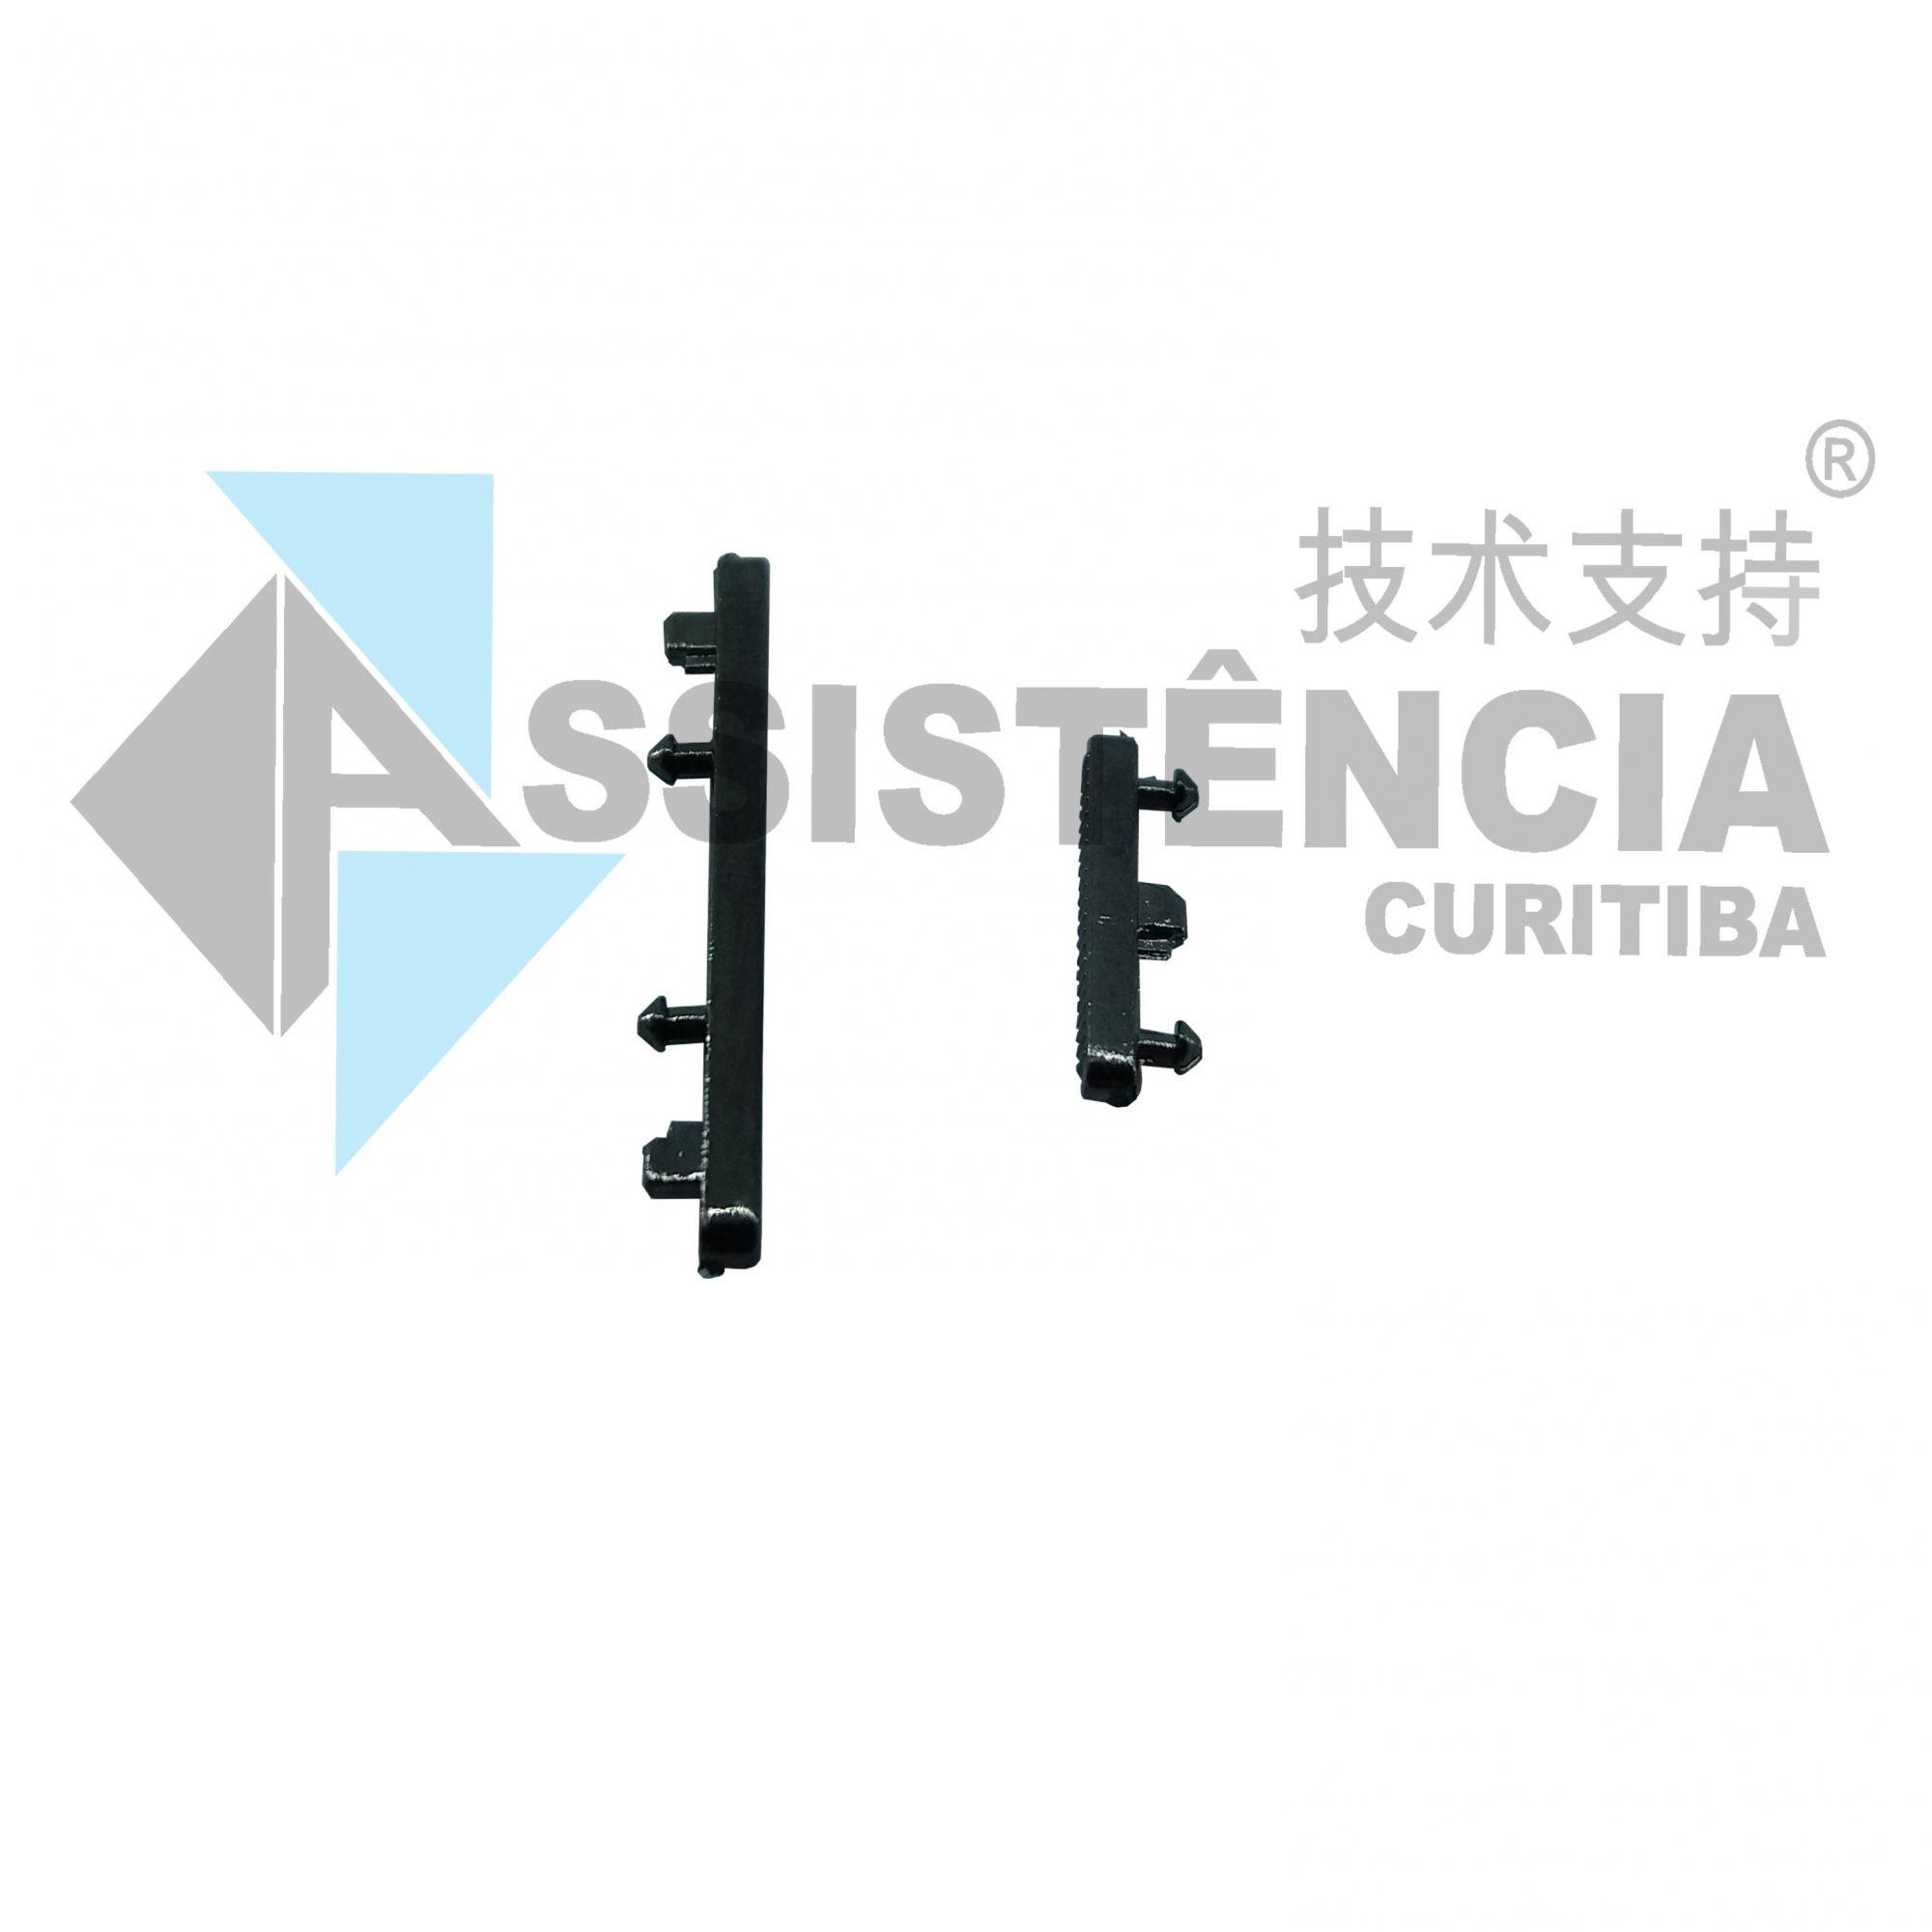 Kit Botão Power E Volume Externo Motorola Moto G4 Play Xt1600 Xt1603 Original